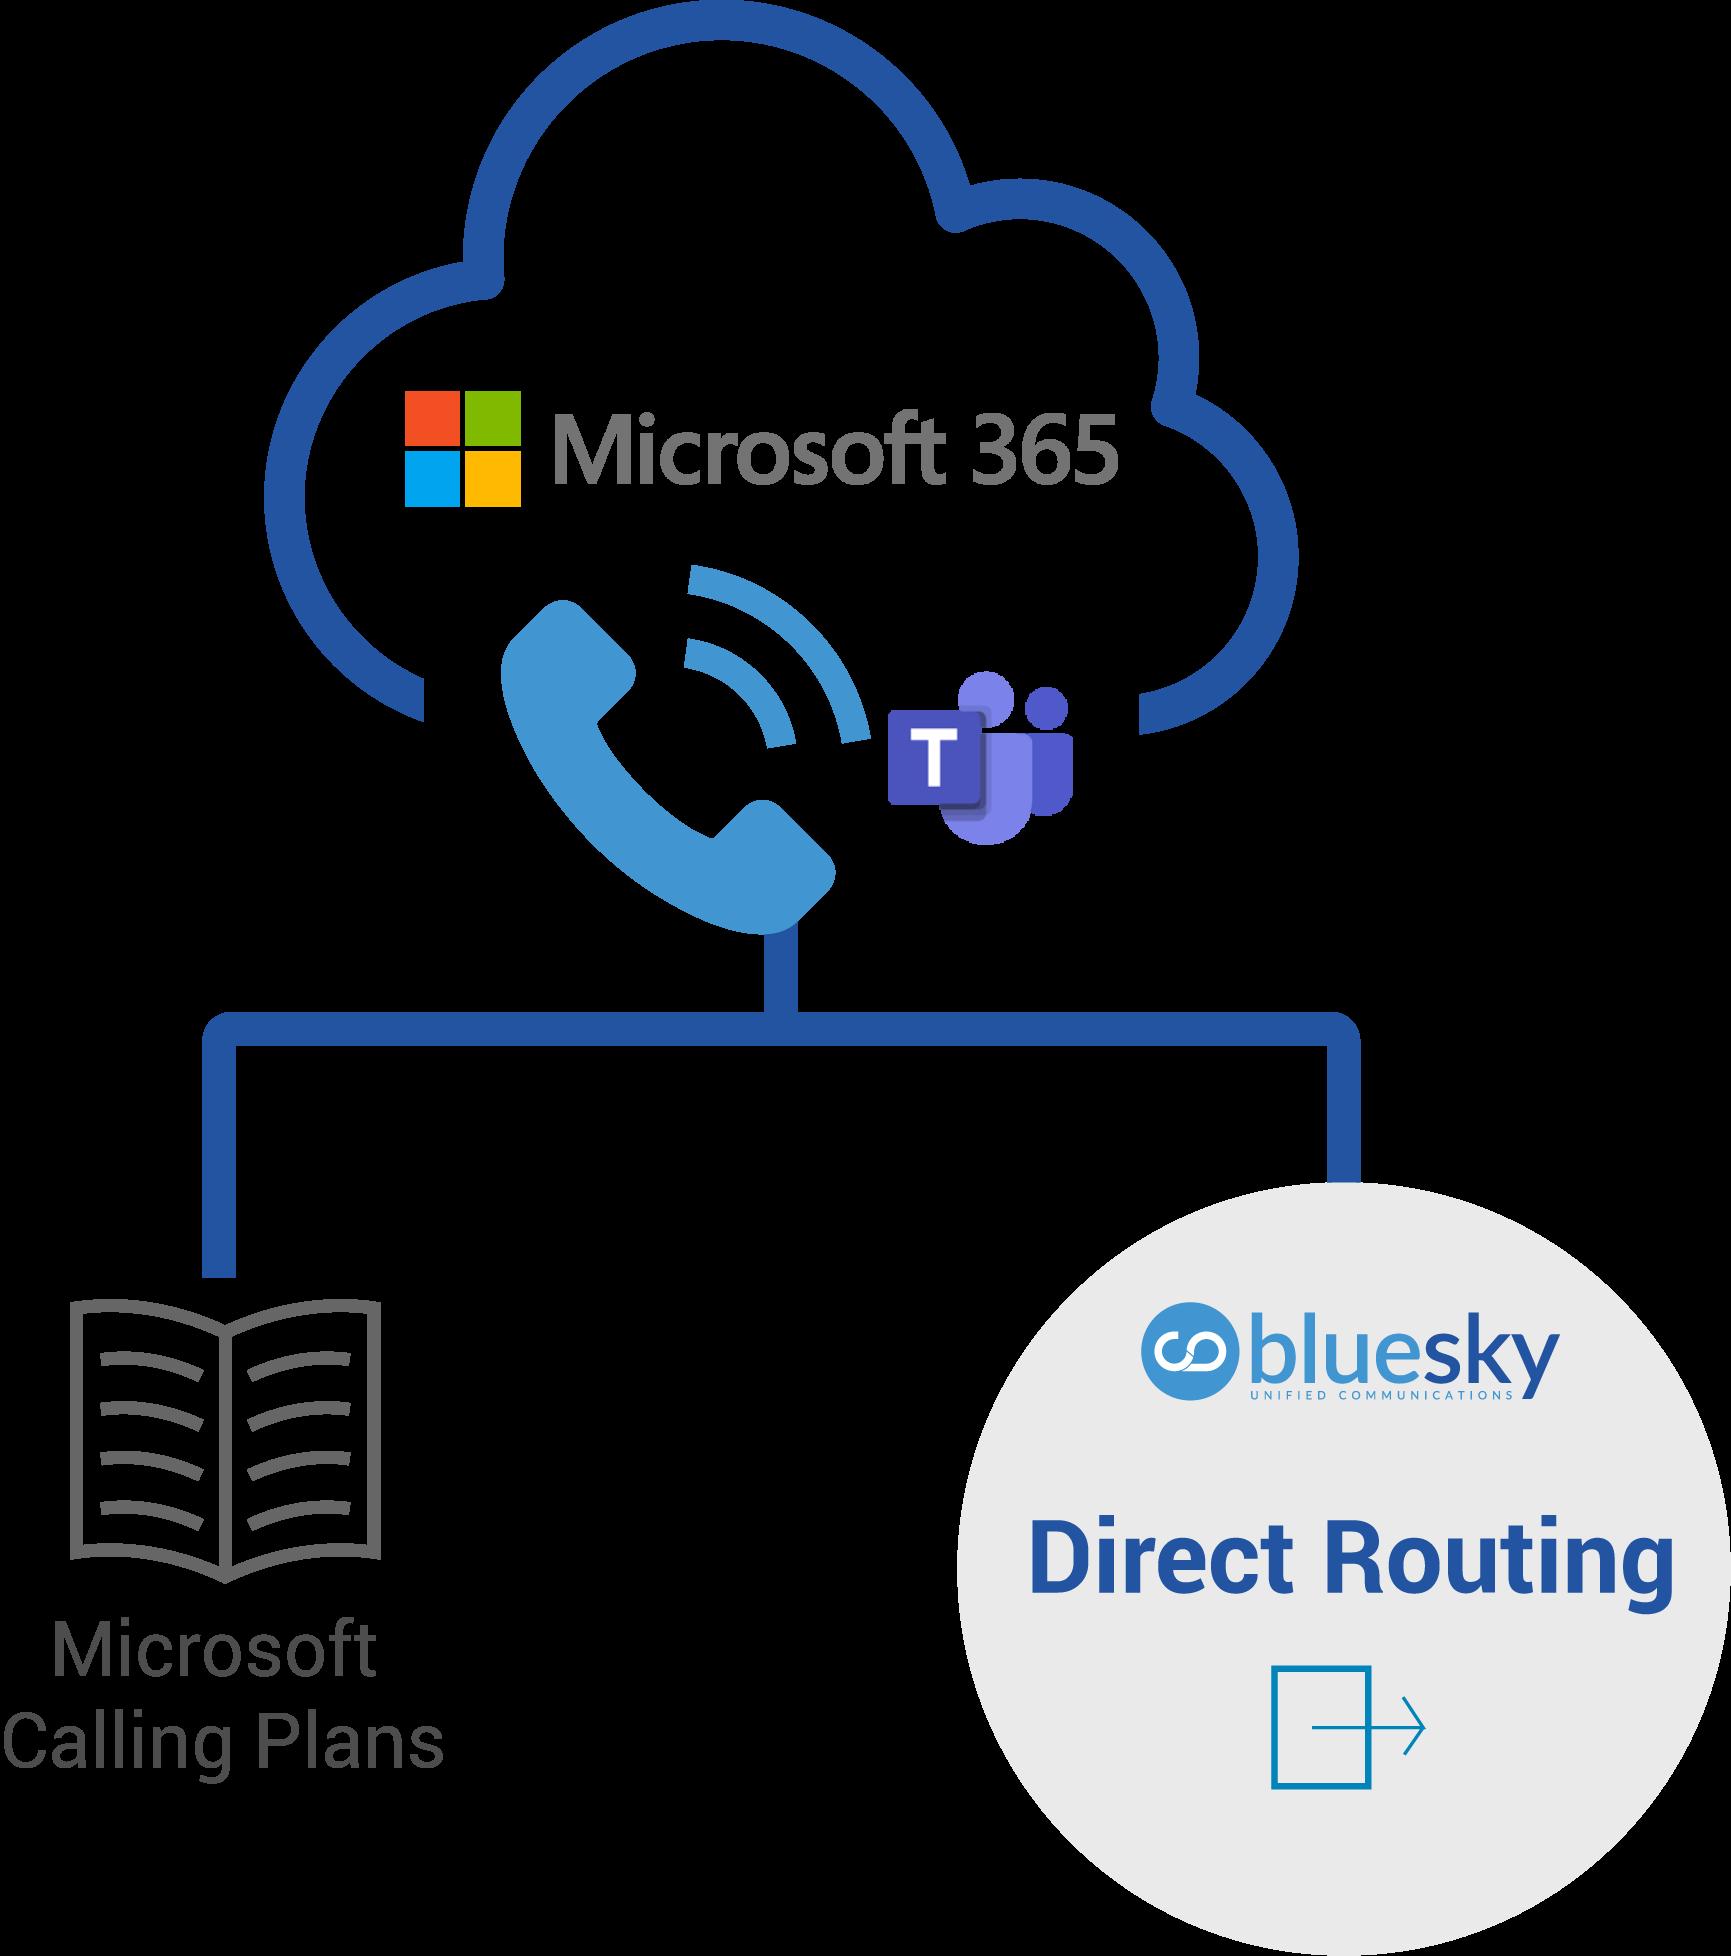 Microsoft Teams Direct Routing Vs. Microsoft Teams Calling Plans